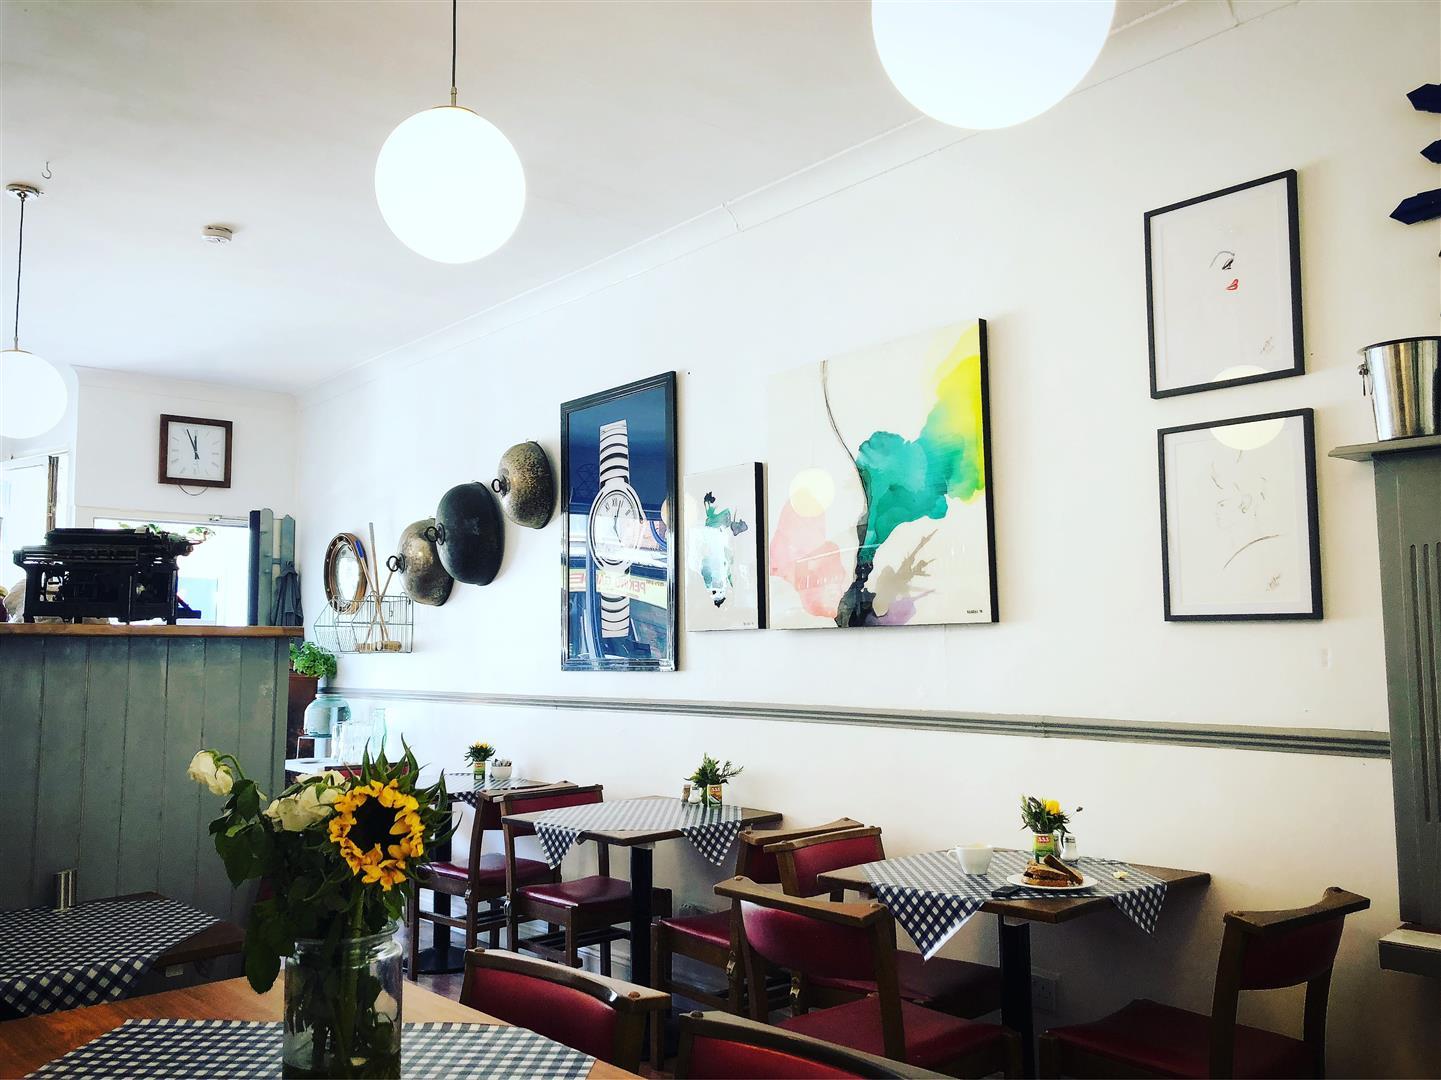 Garratt Lane, Wandsworth, London - Andrew Scott Robertson